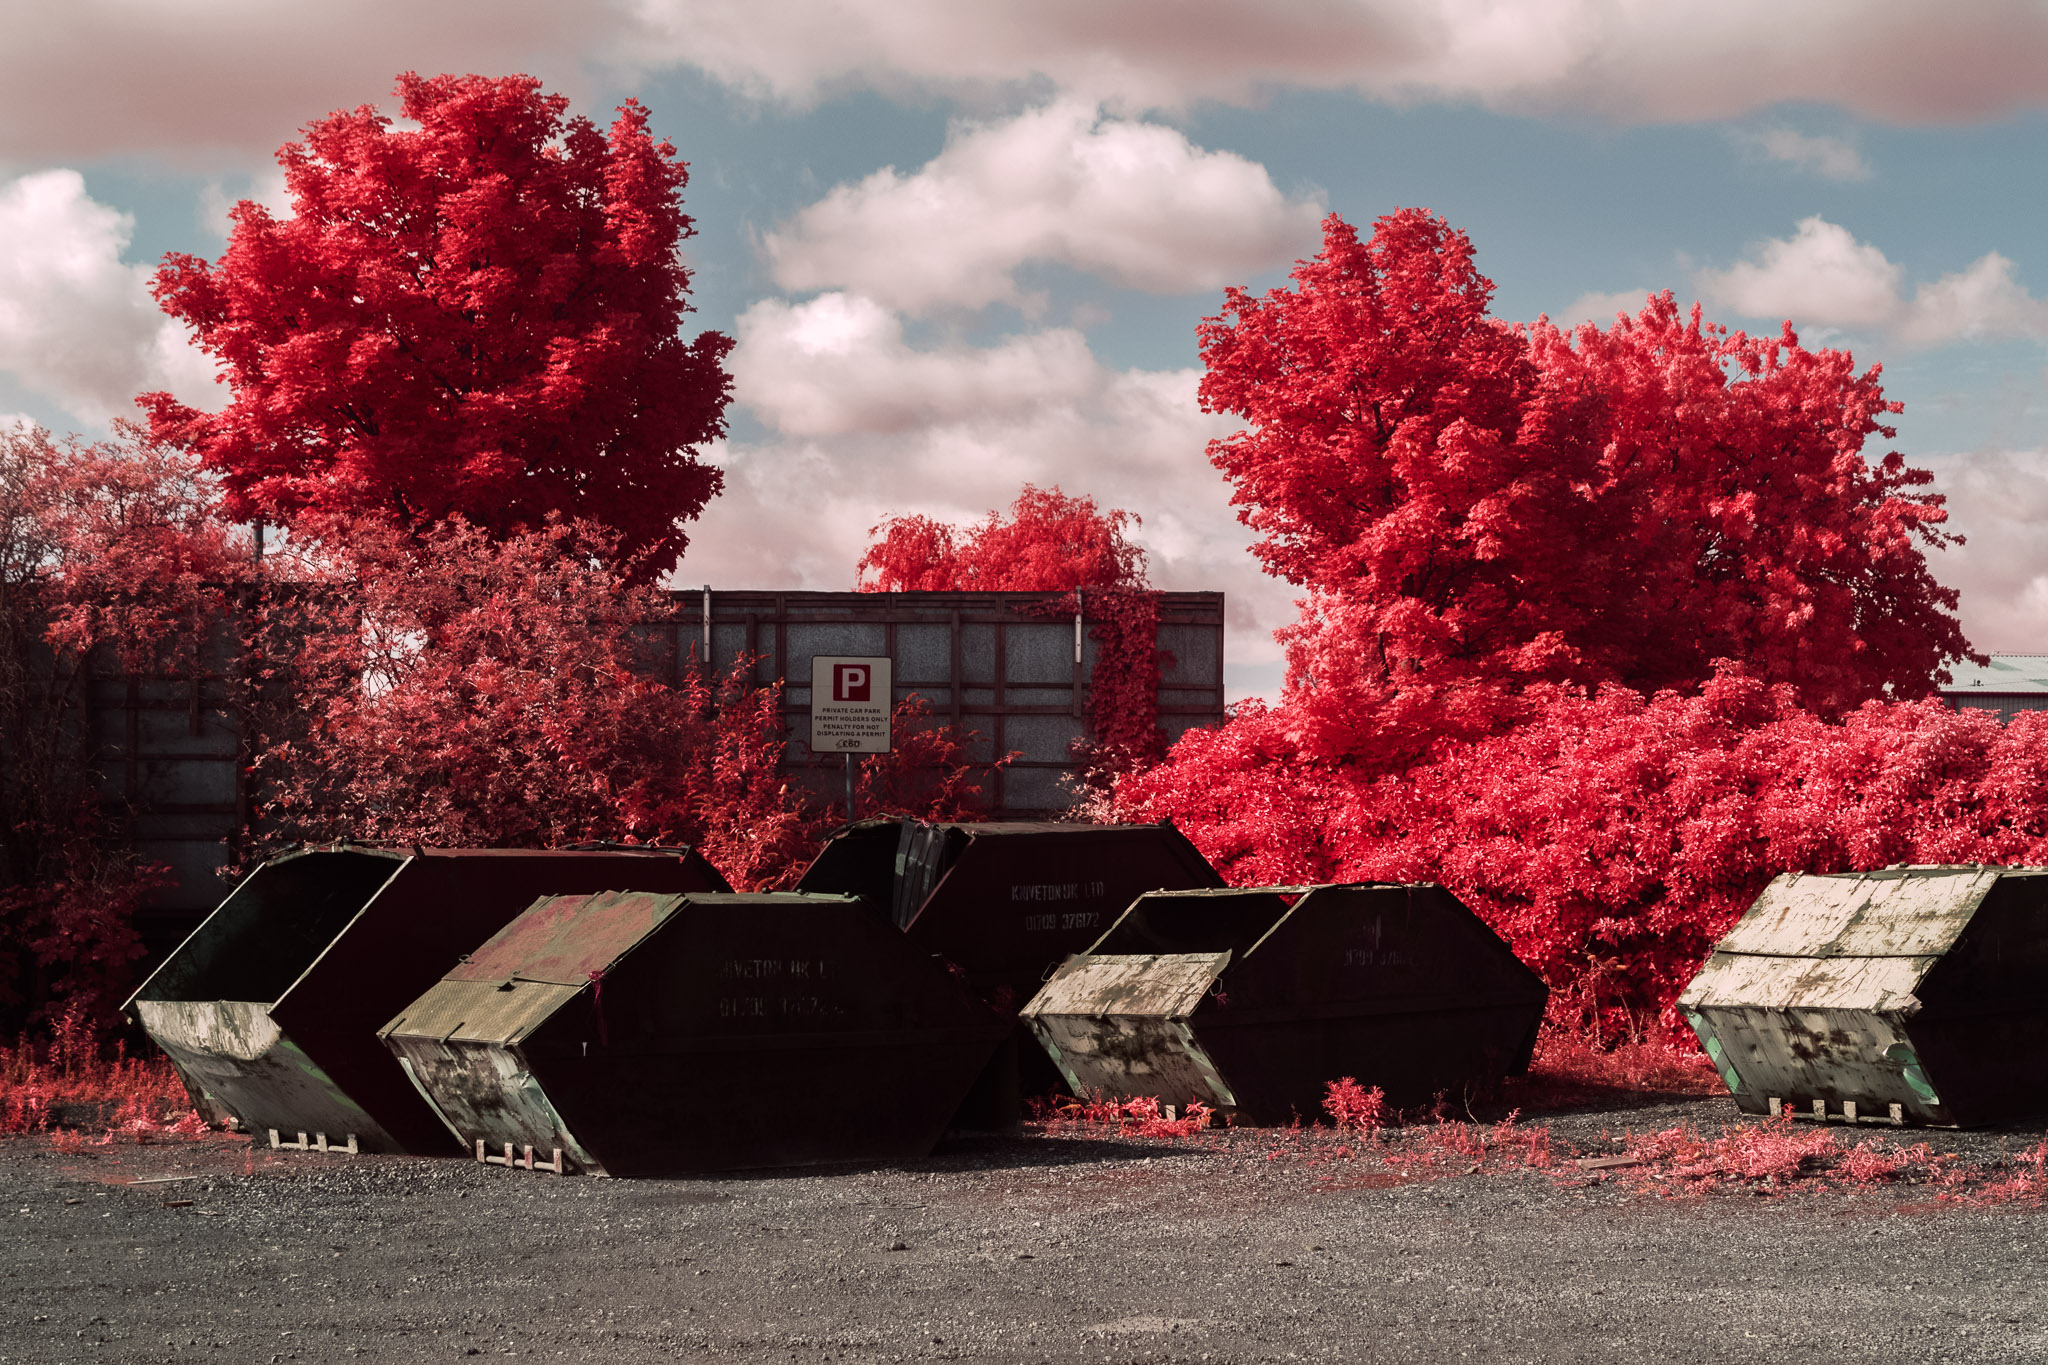 Kodak EIR Colour Infrared, Edgelands, Wasteland, Out of sight,  Skips ©Jonny Sutton